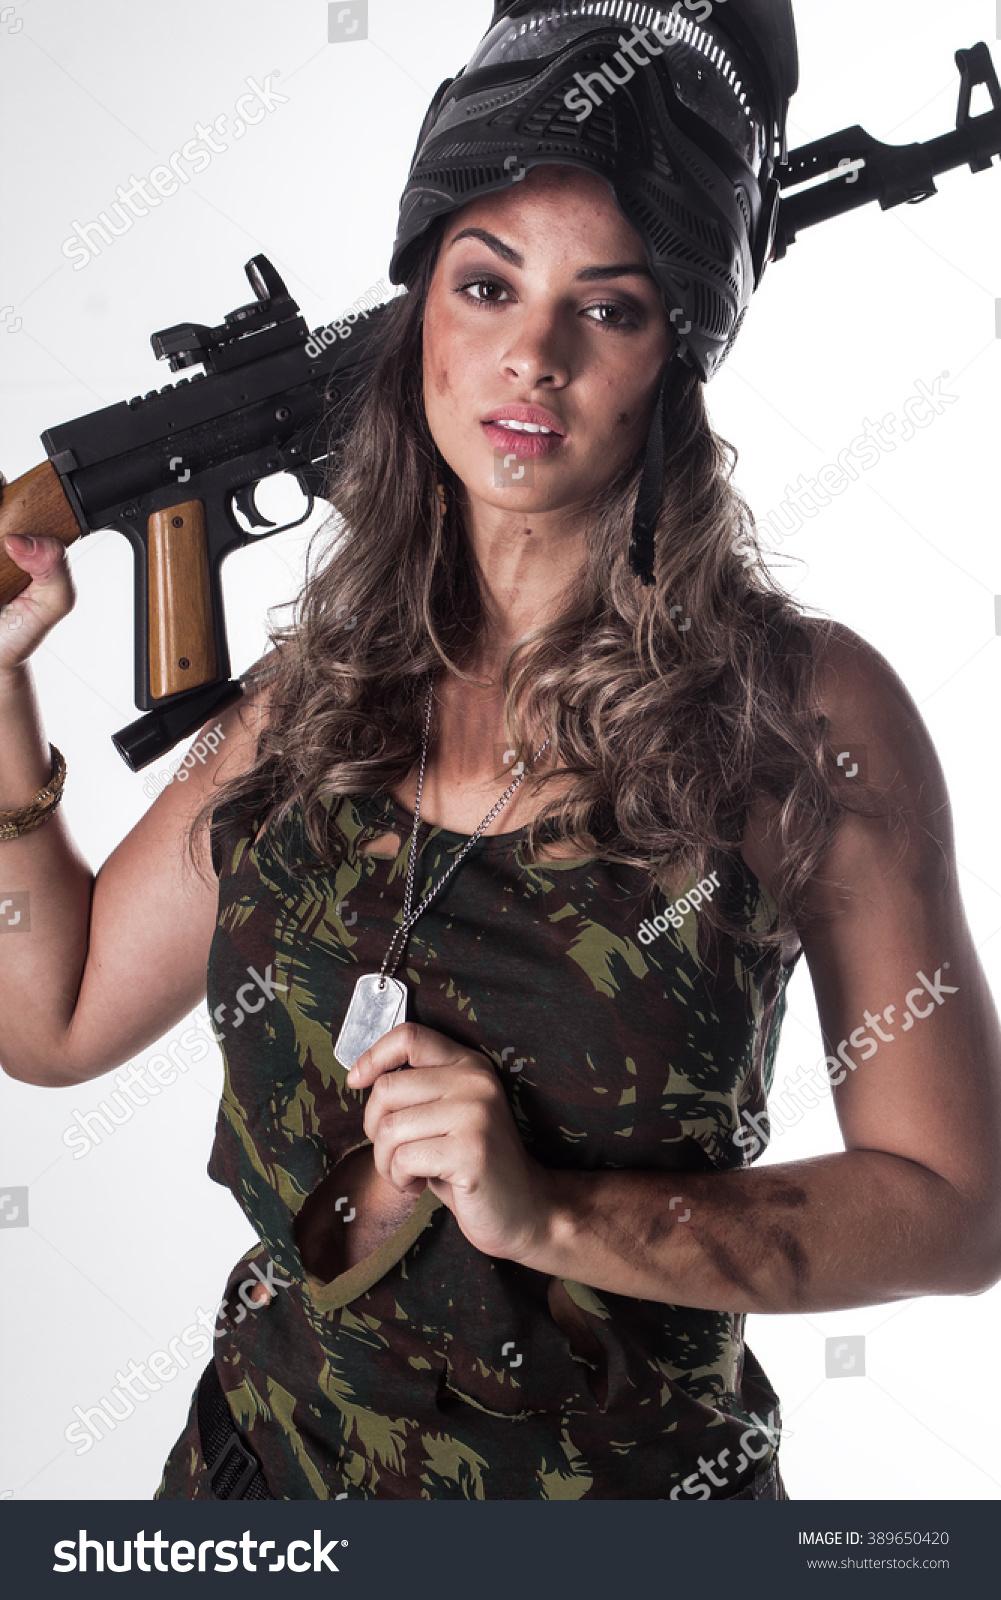 Photography women in brazil posing with guns foto 836